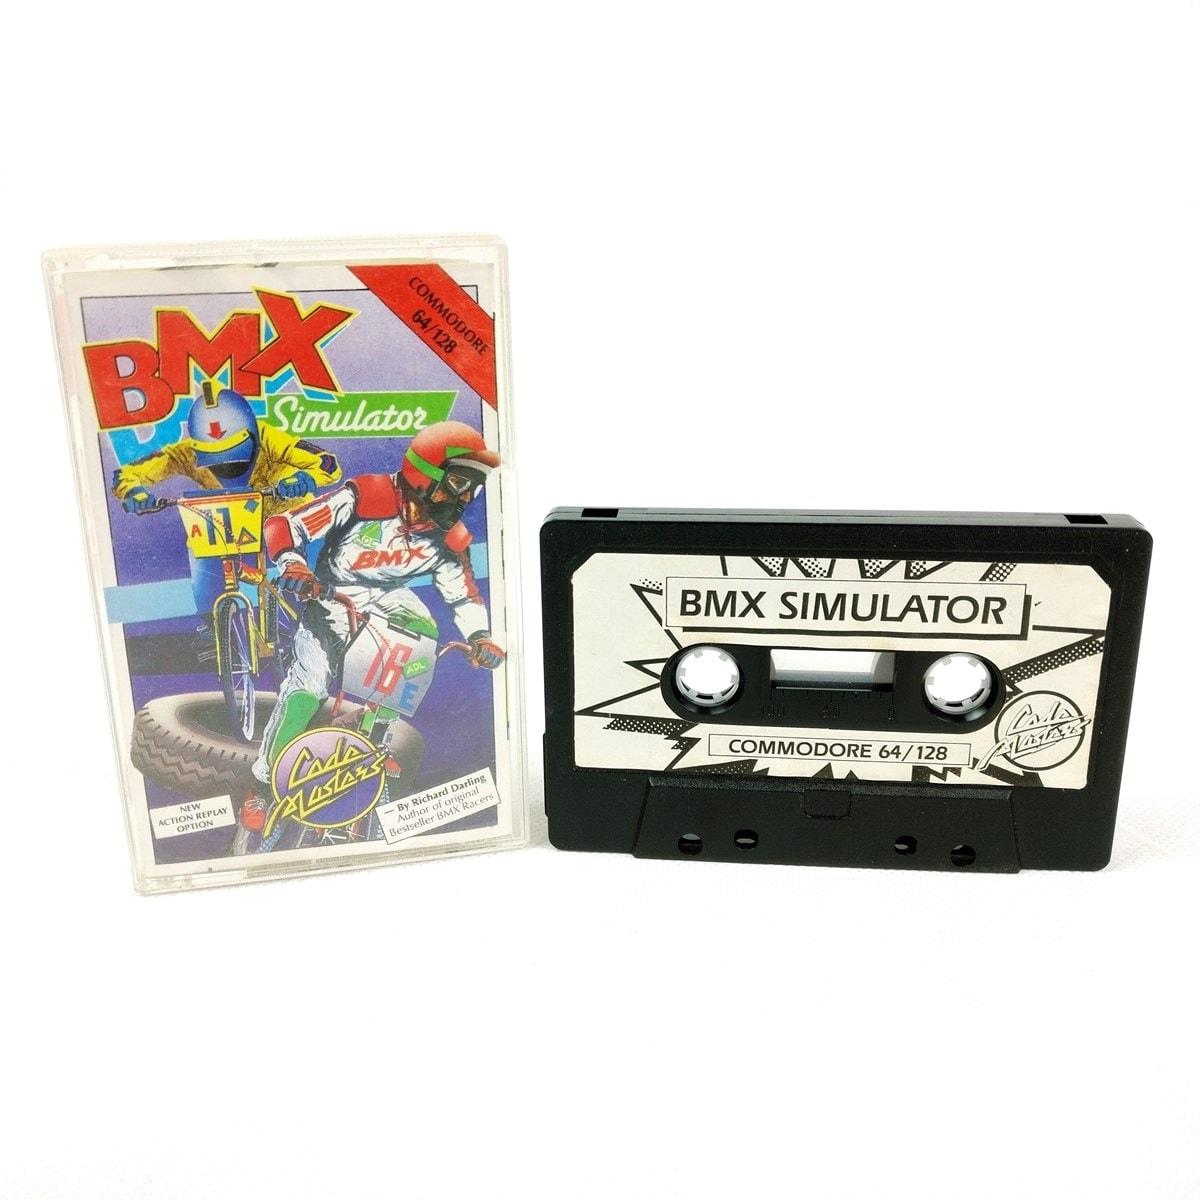 BMX Simulator (C64 Cassette)